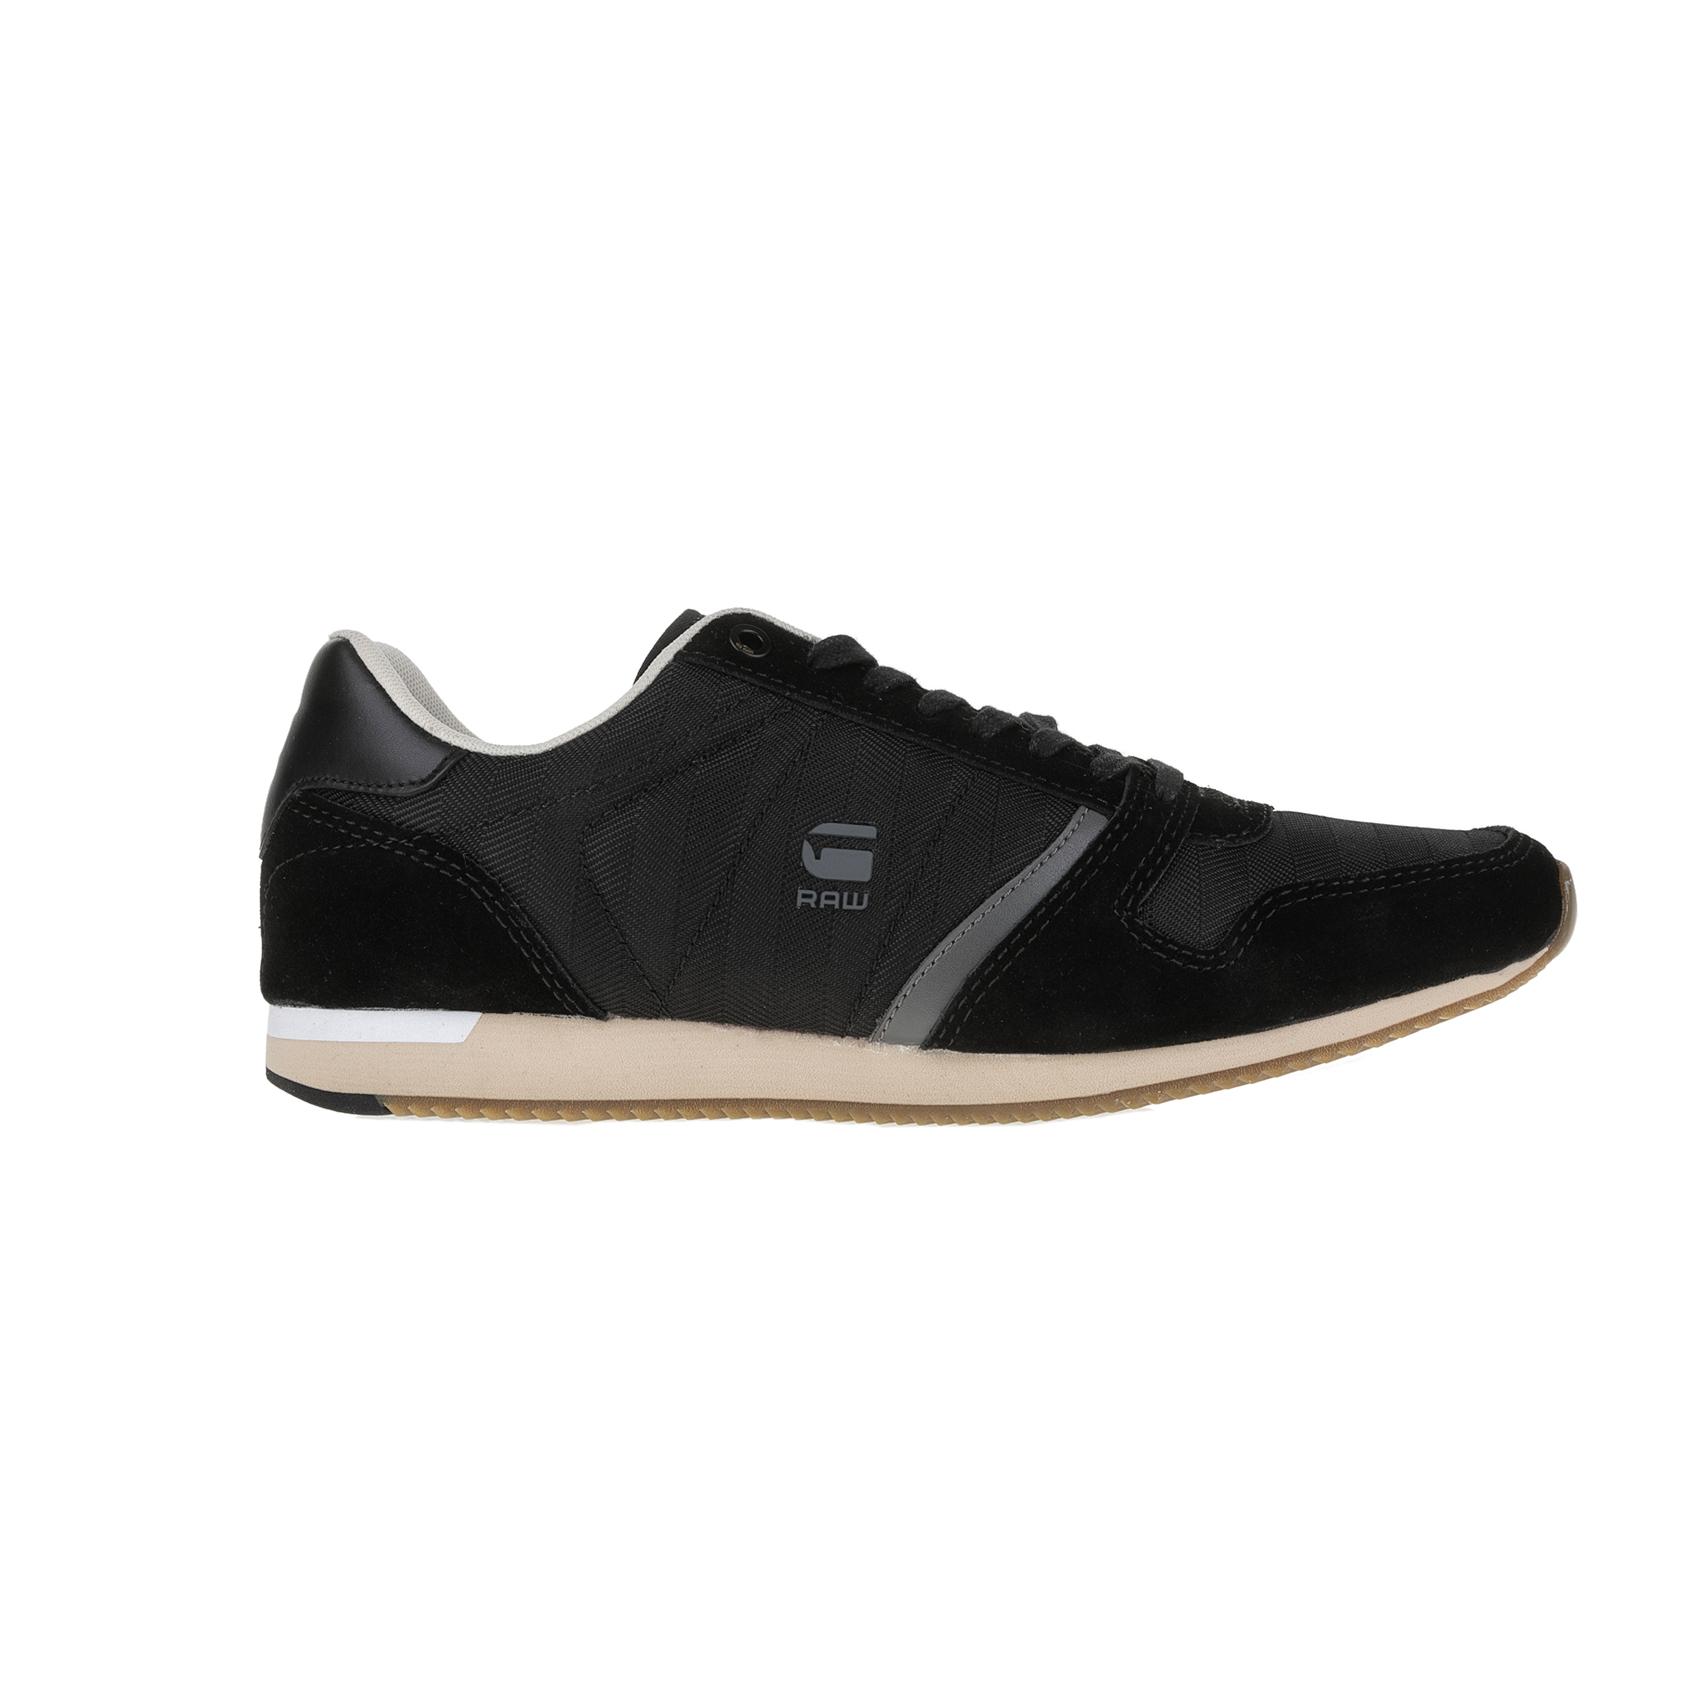 G-STAR RAW – Ανδρικά παπούτσια G-STAR TURNER μαύρα